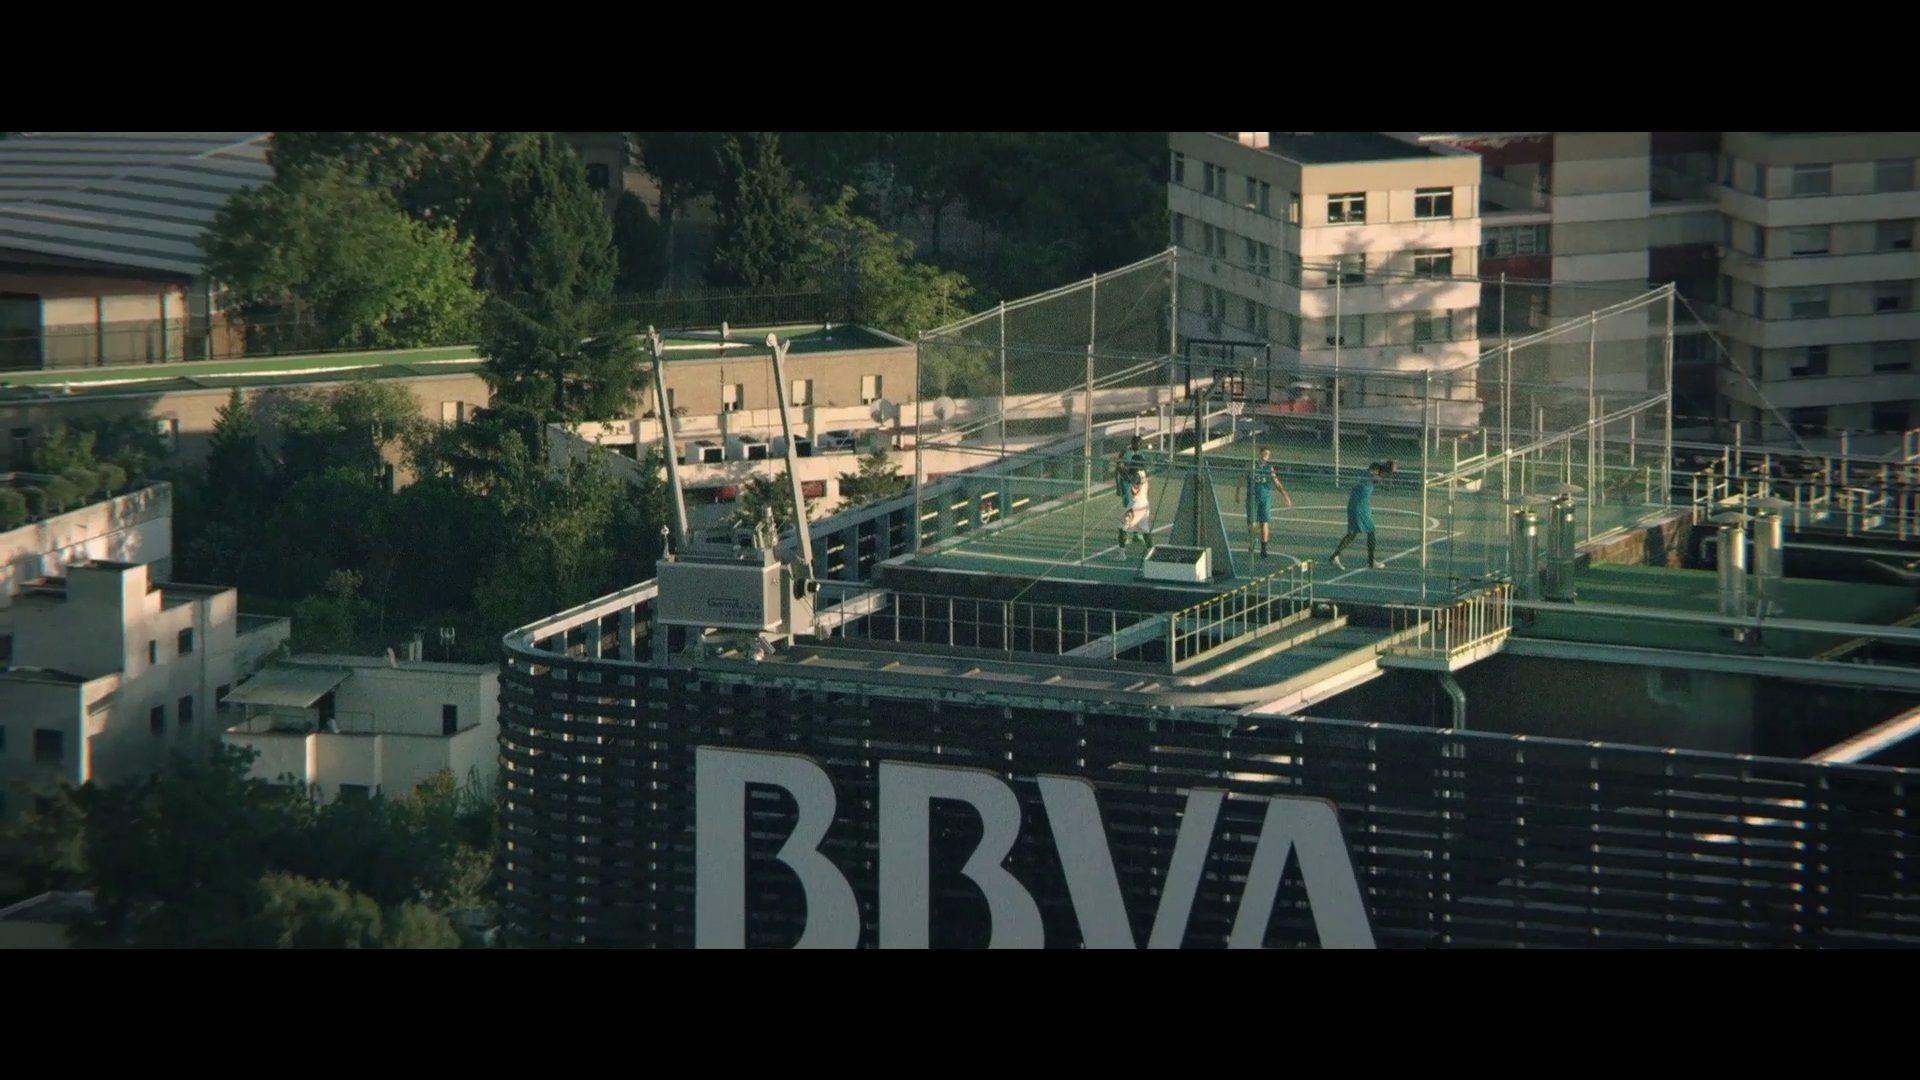 fotograma-del-video-cancha-de-baloncesto-en-la-torre-bbva-de-madrid-2